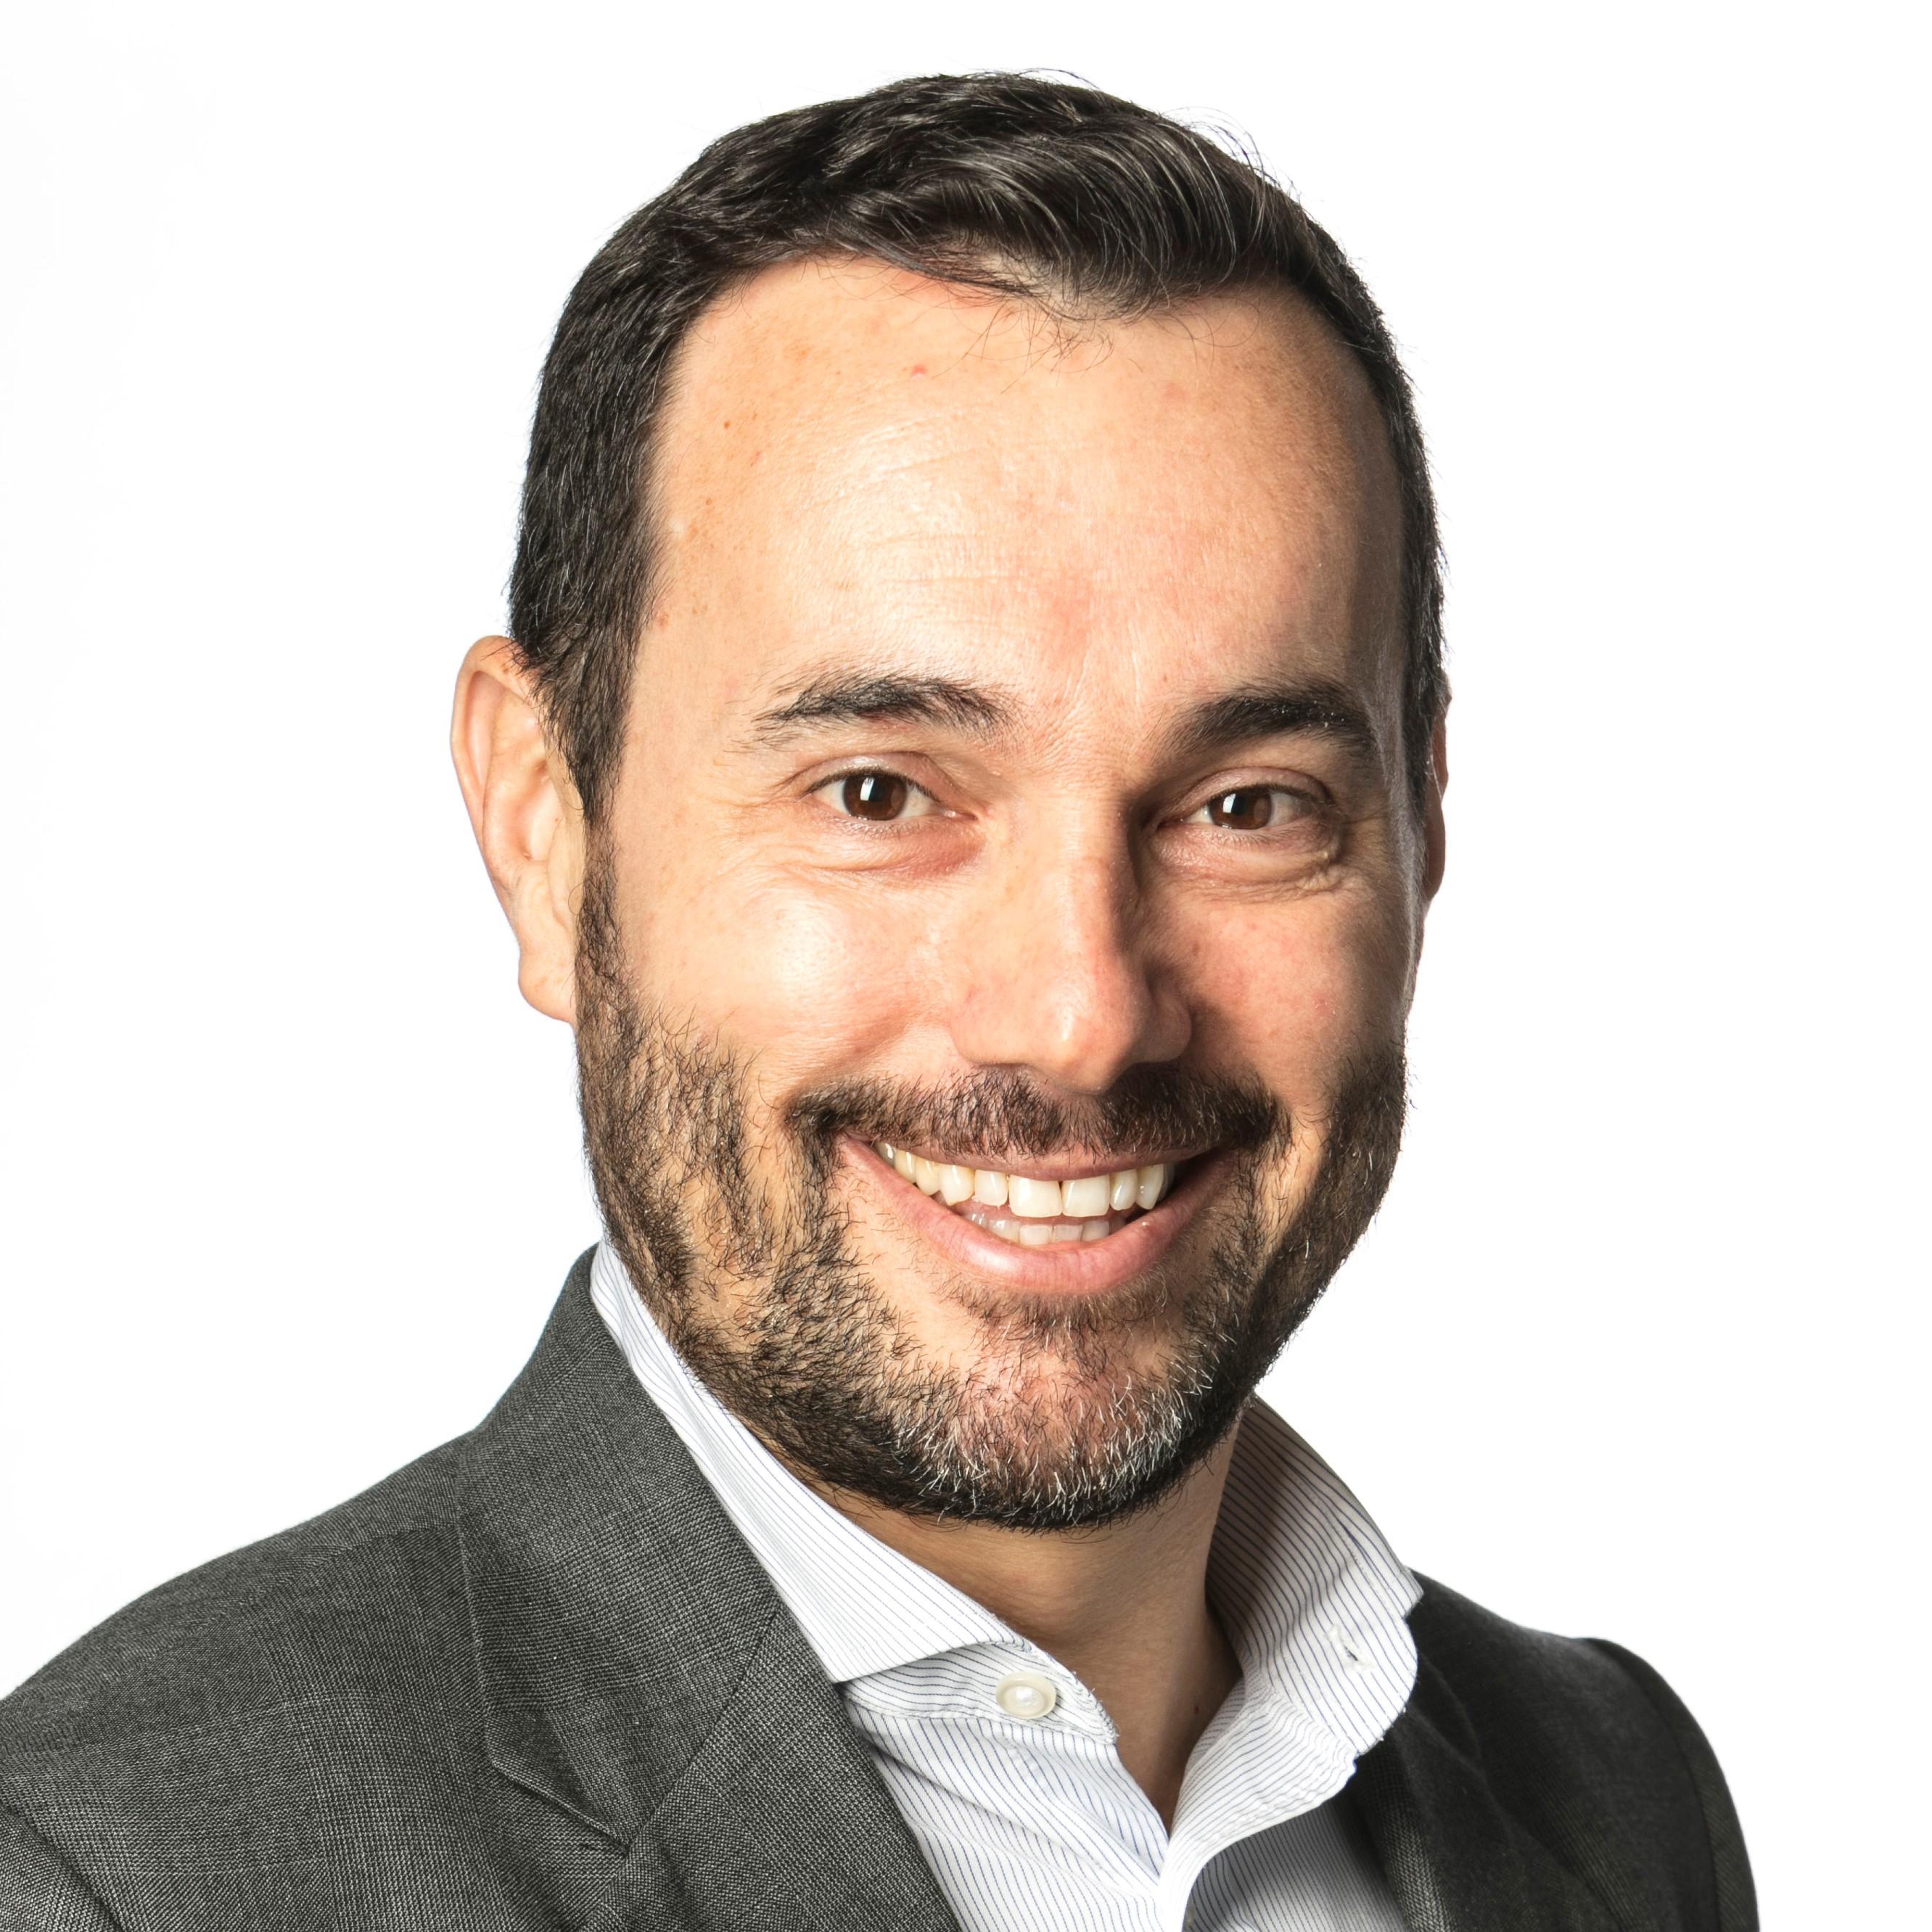 Jaime Martín Juez